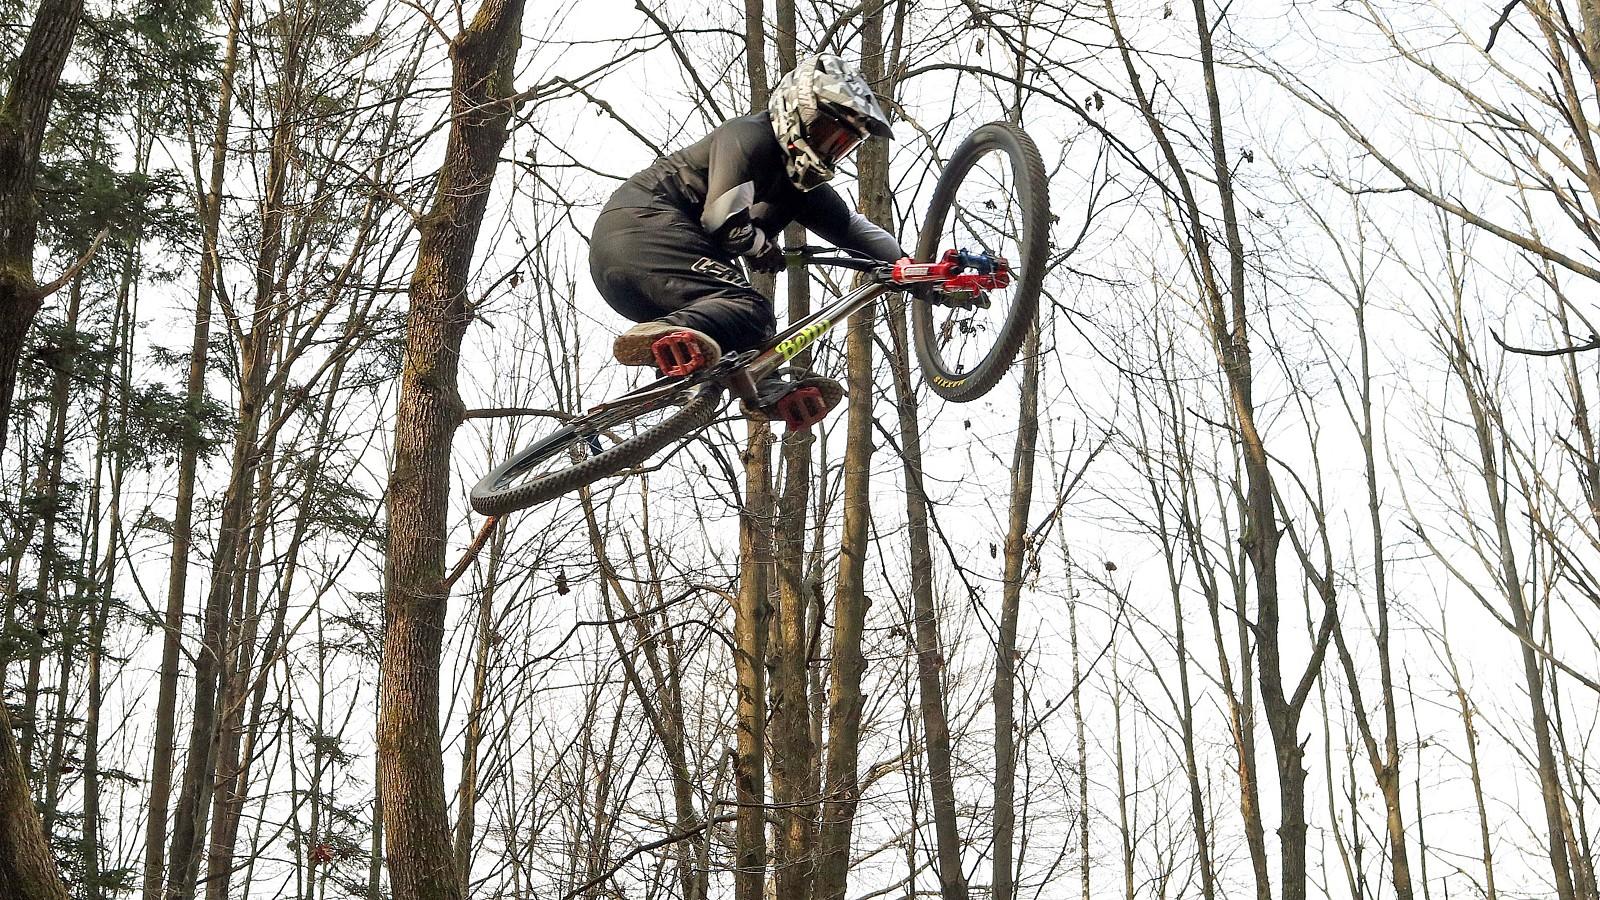 table jan step up - porson - Mountain Biking Pictures - Vital MTB